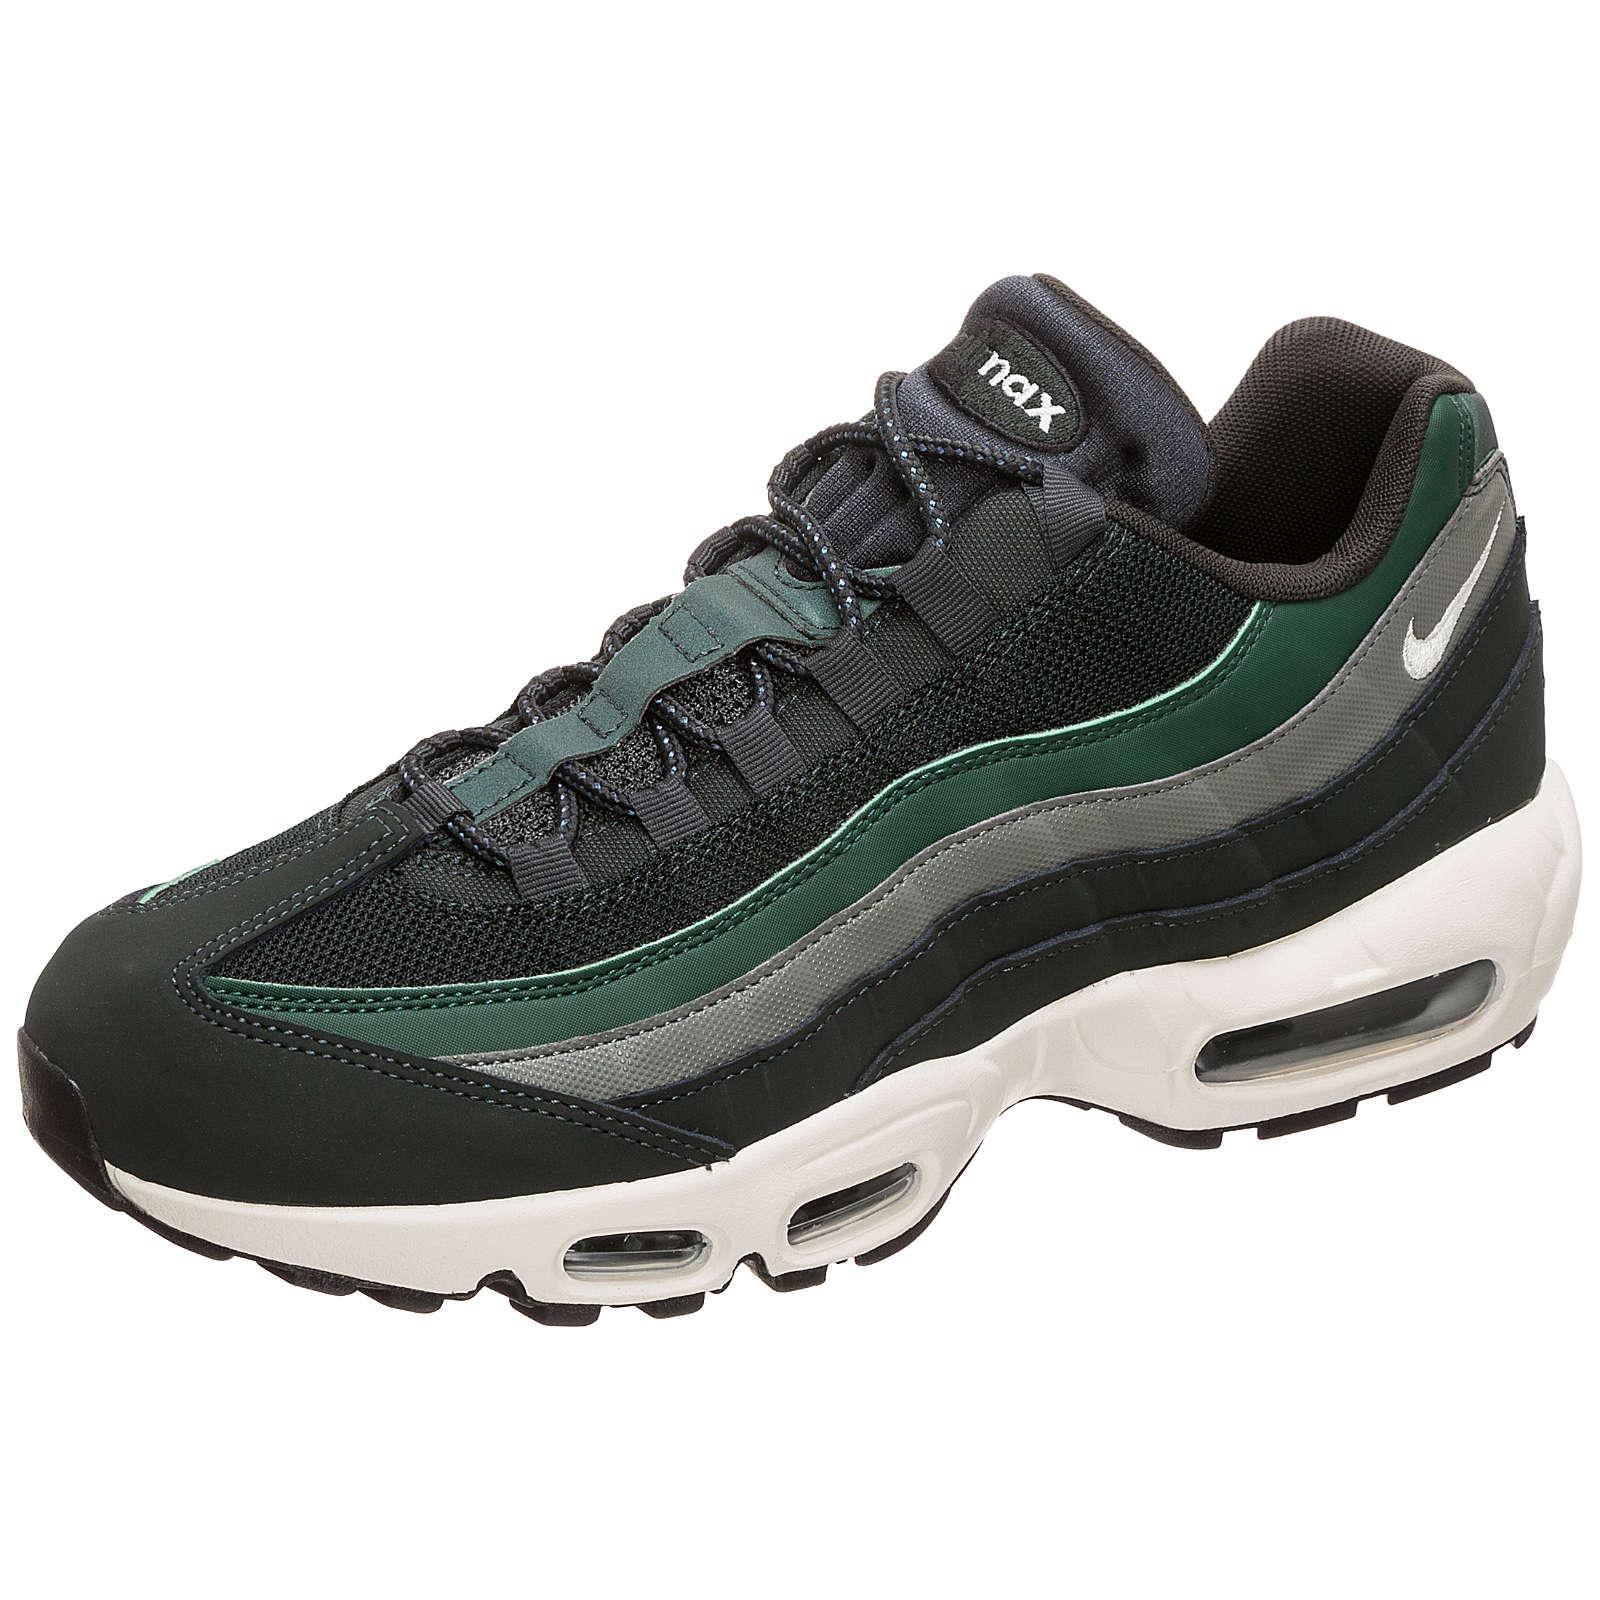 Nike Sportswear Air Max 95 Essential Sneaker Herren grün Herren Gr. 43